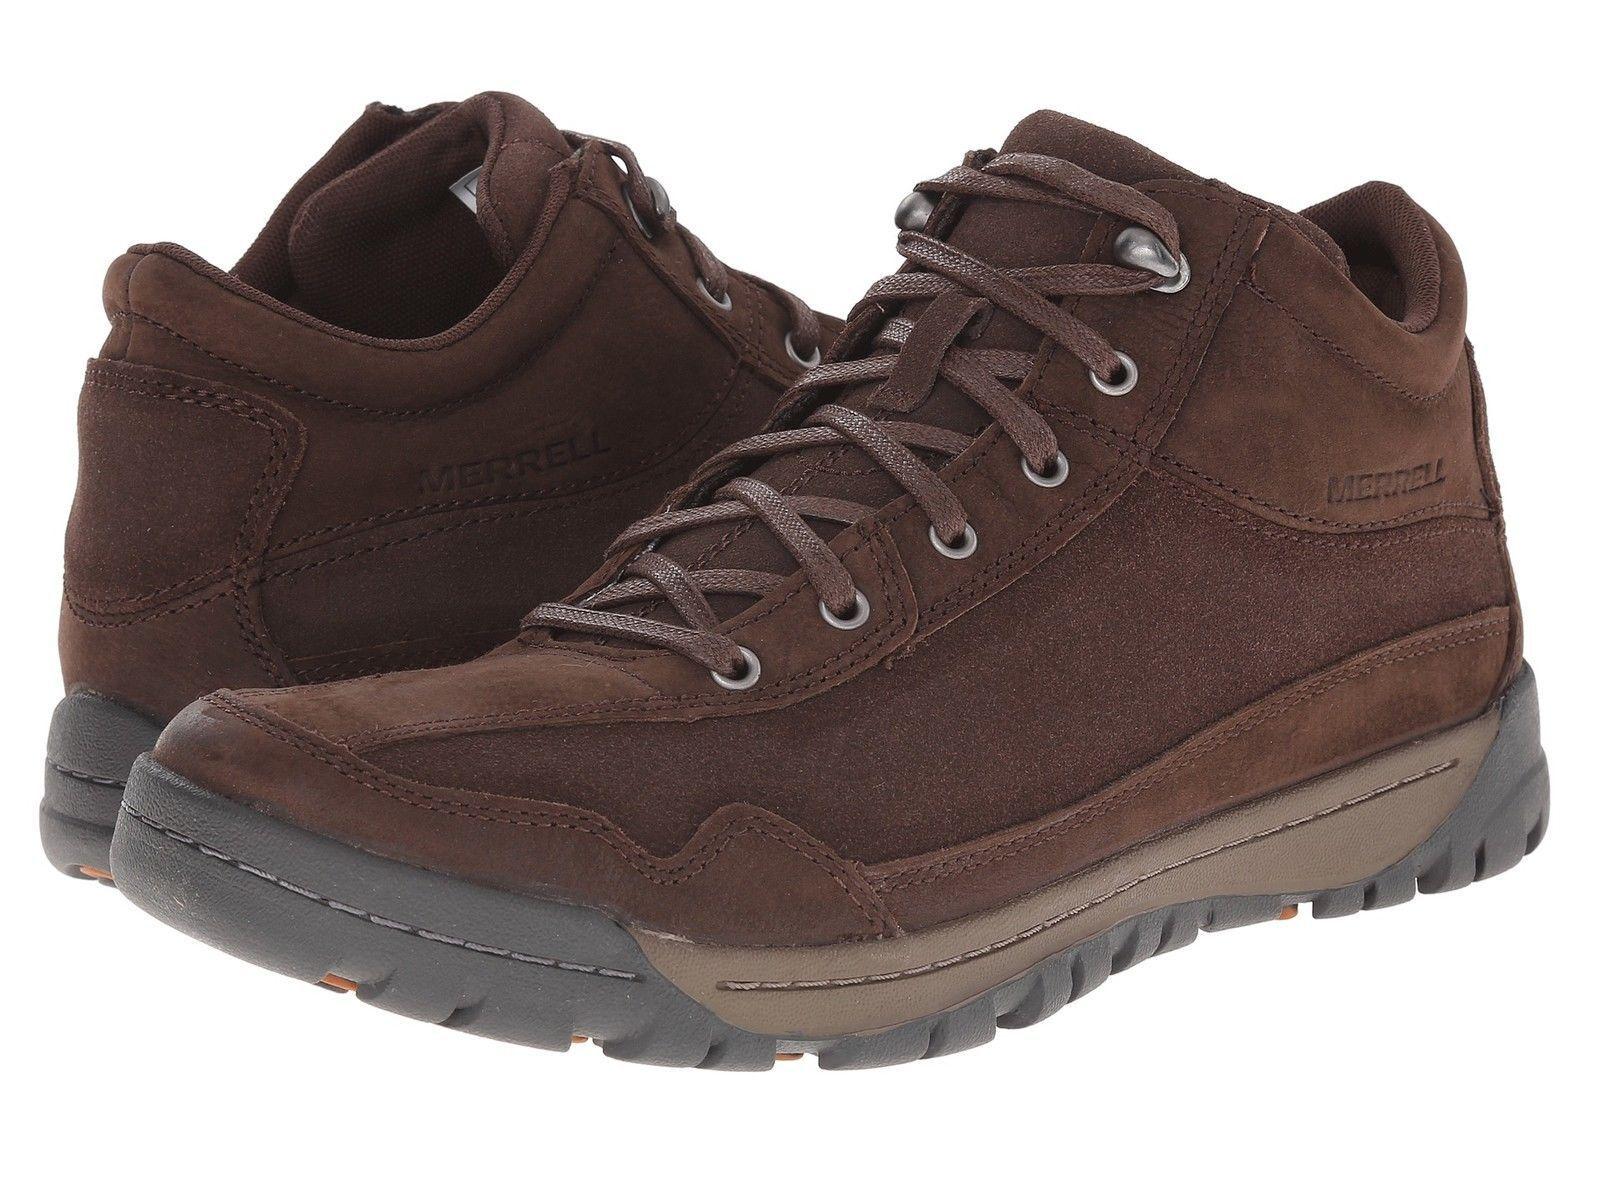 NWT Men Merrell Traveler Field Mid Hiking Boot Walking Sneaker Leather Size 7-11